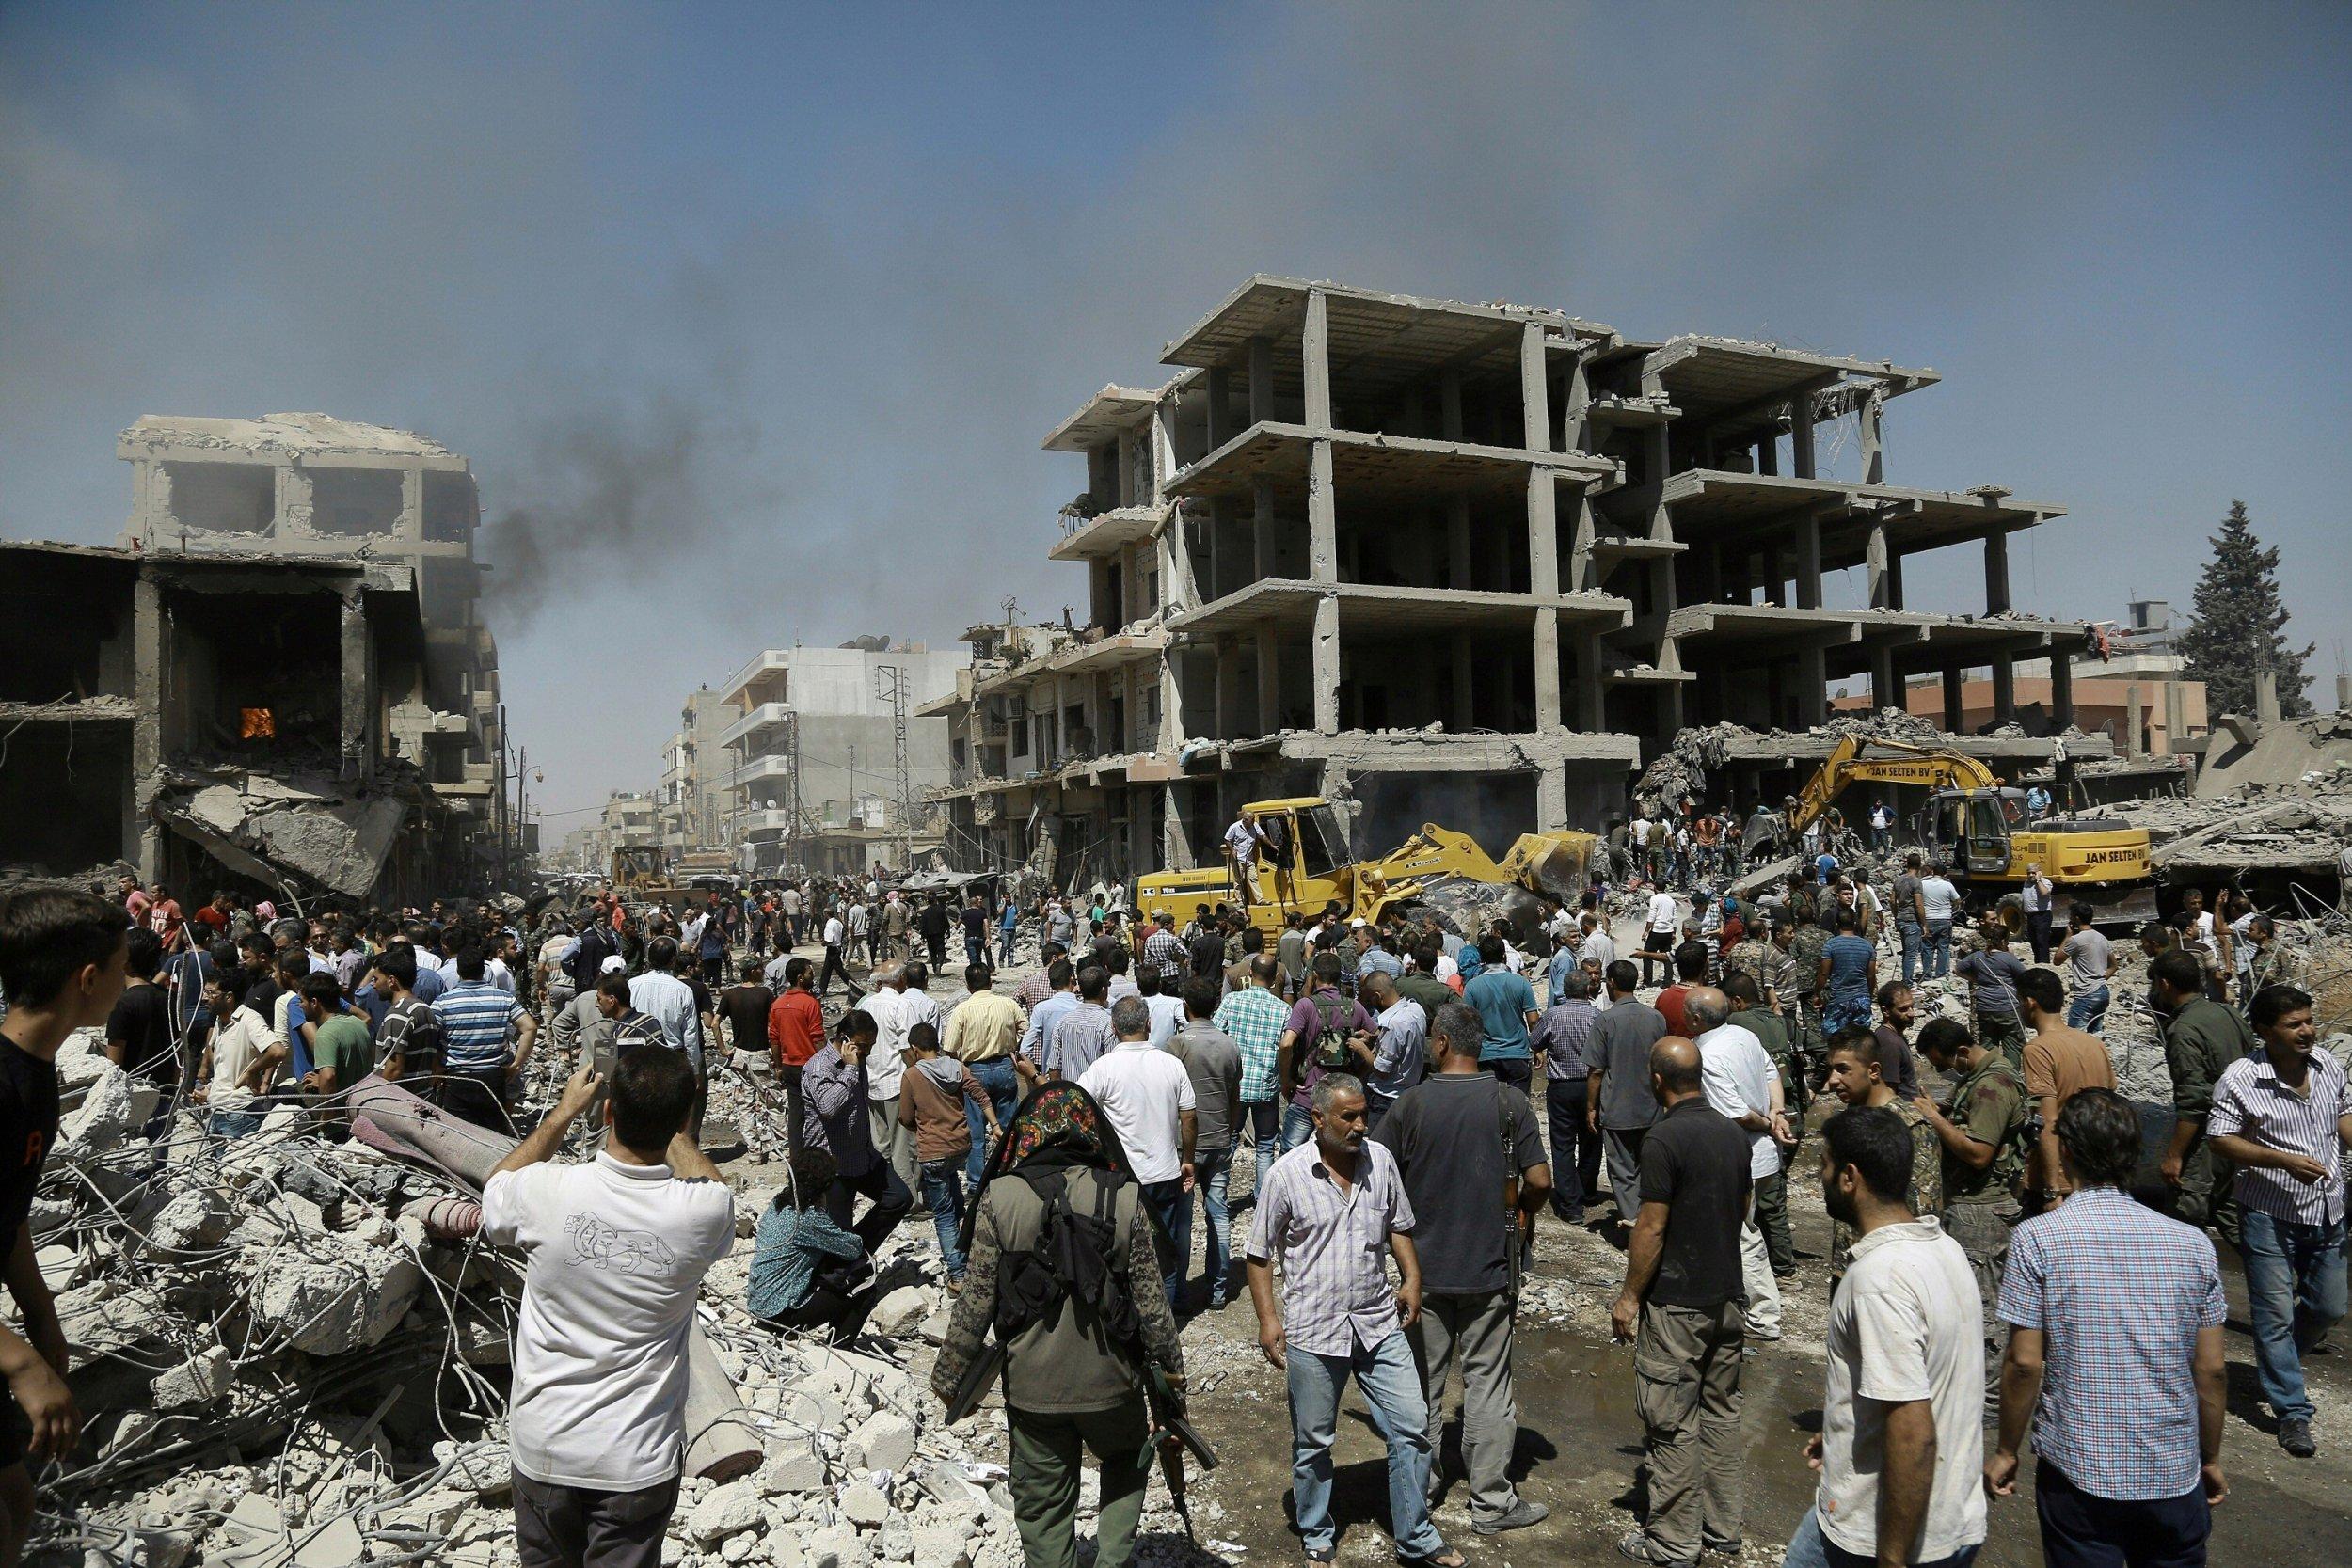 ISIS Qamishli bomb attack in northern Syria